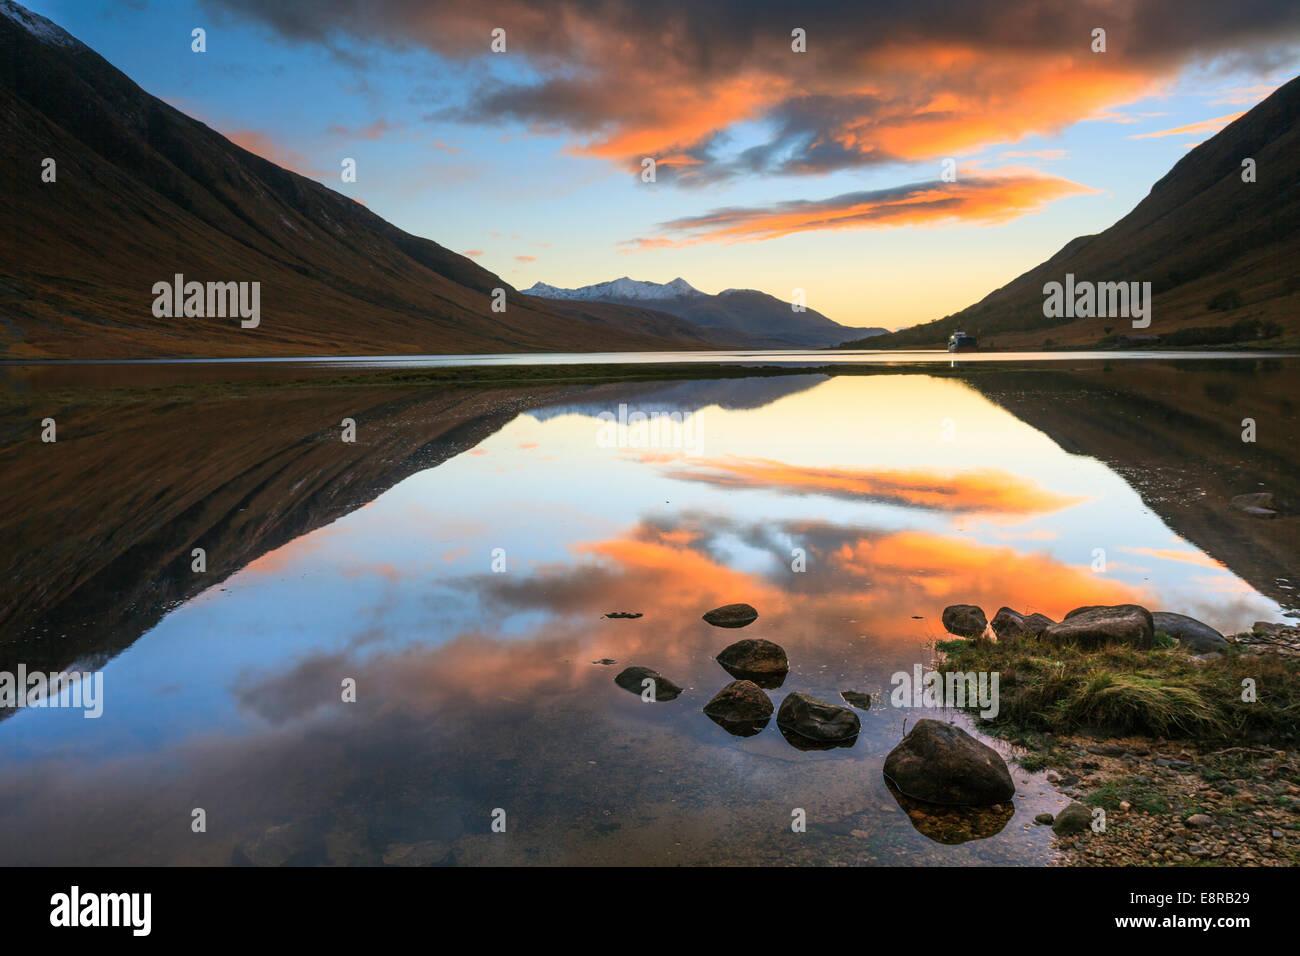 Loch Etive captured at sunset. - Stock Image